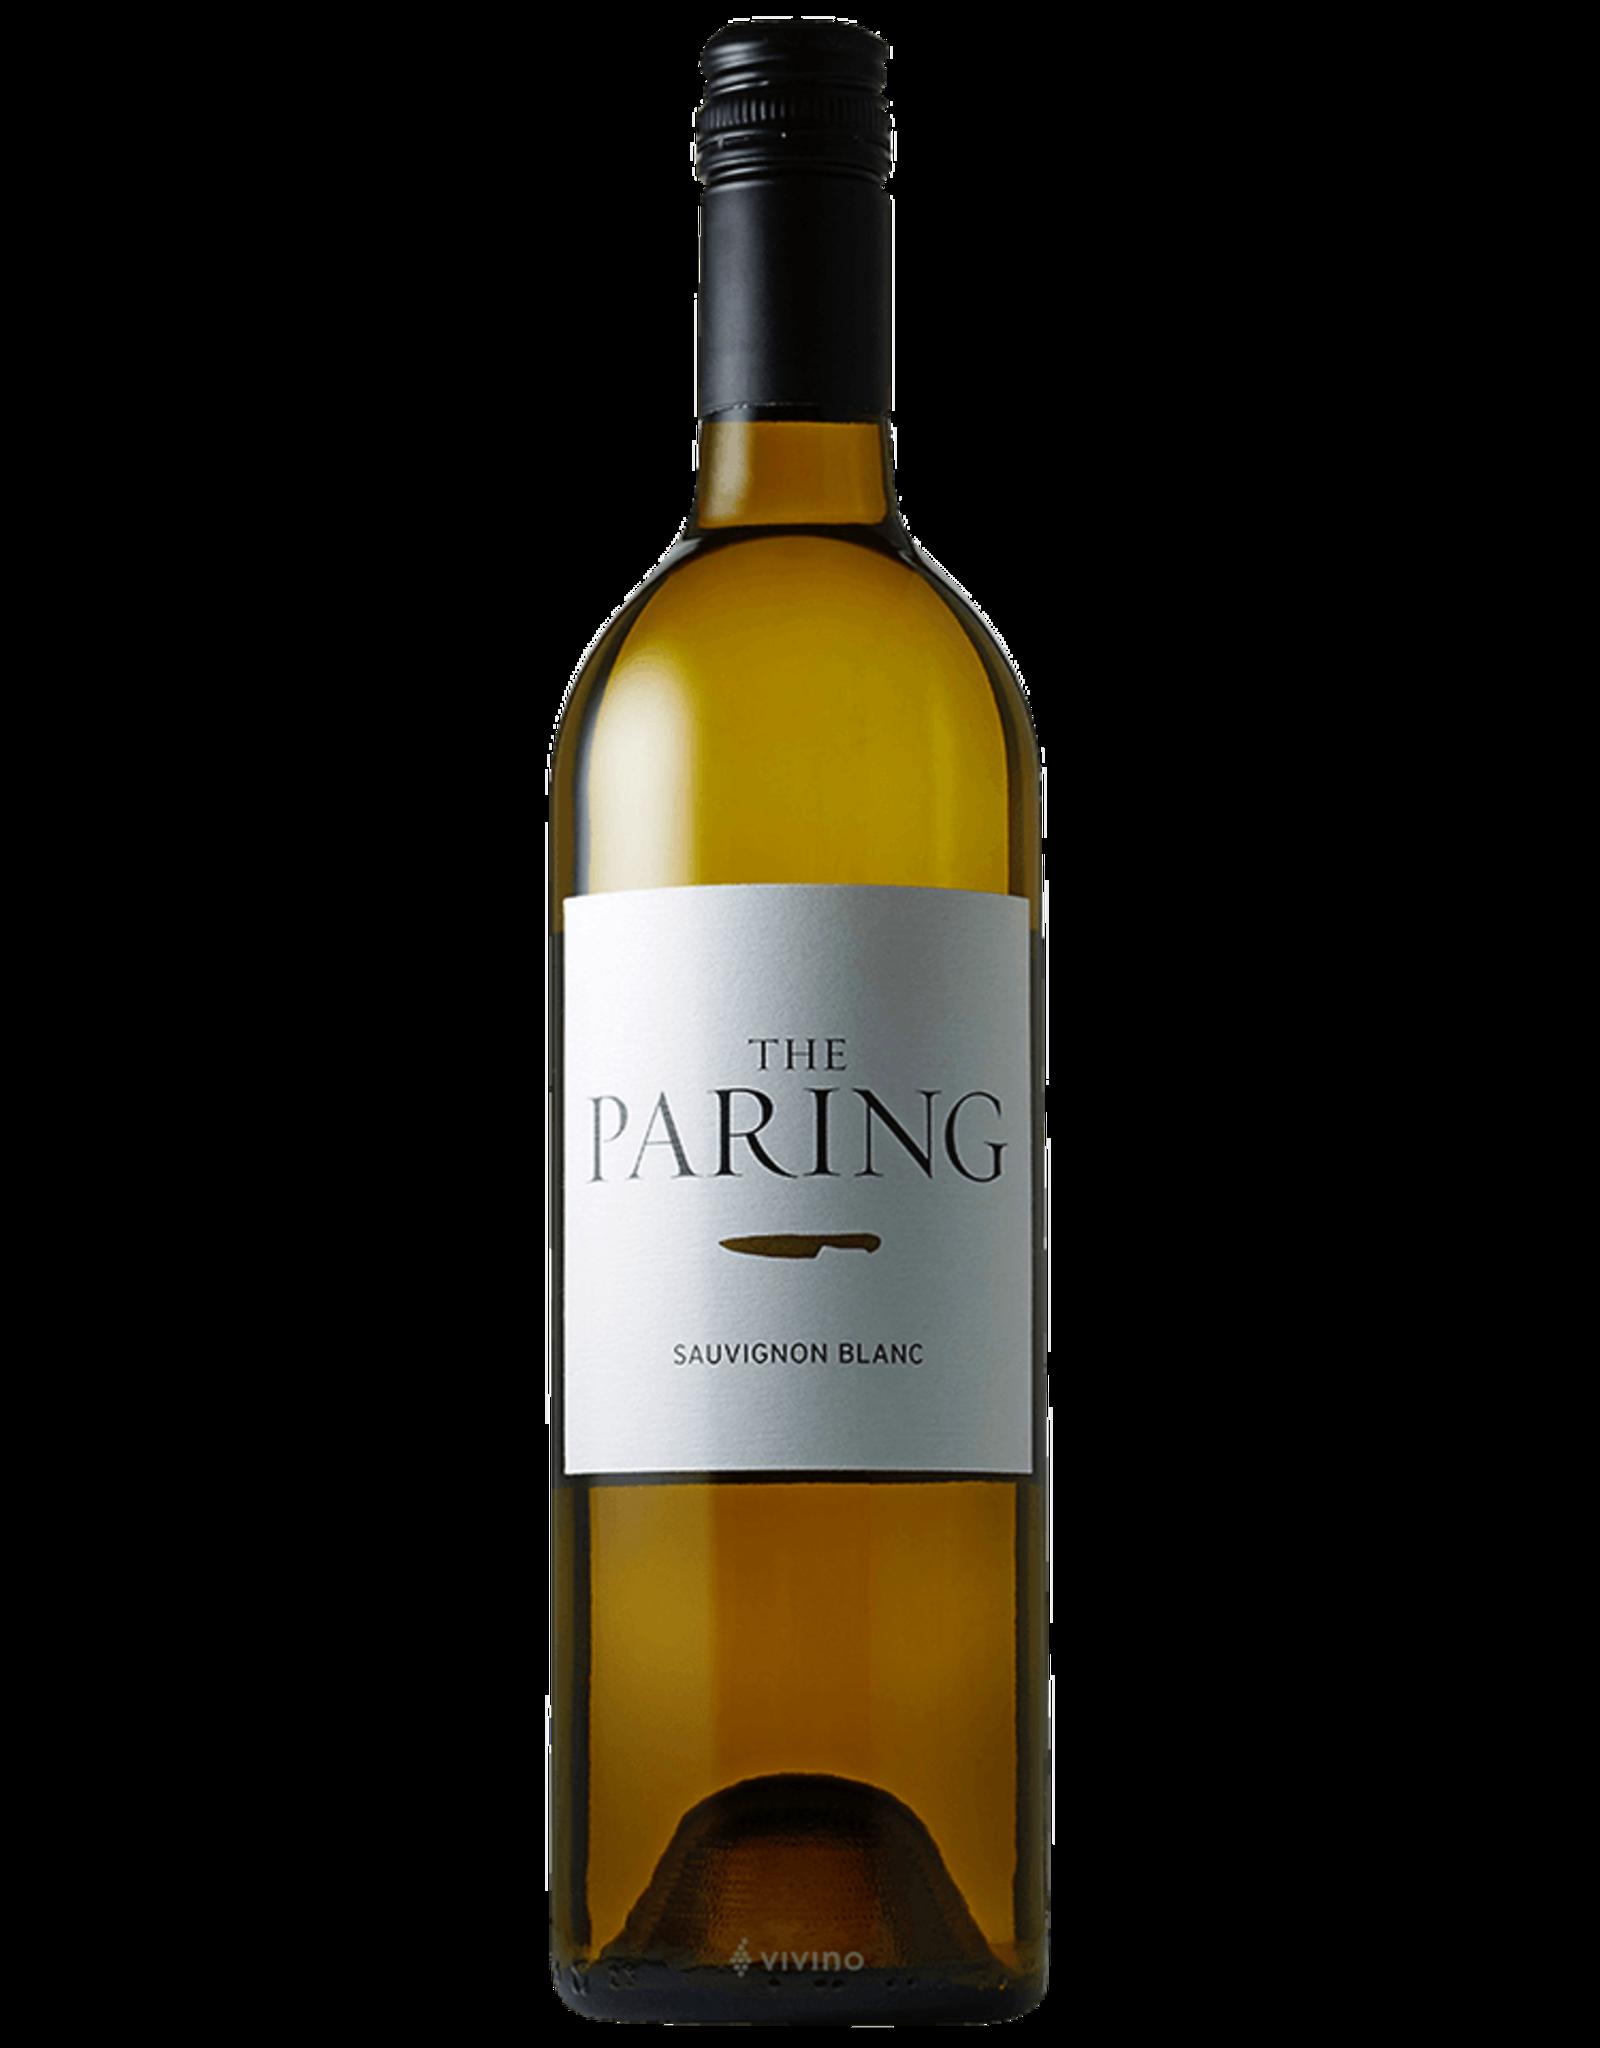 The Paring Sauvignon Blanc 2018